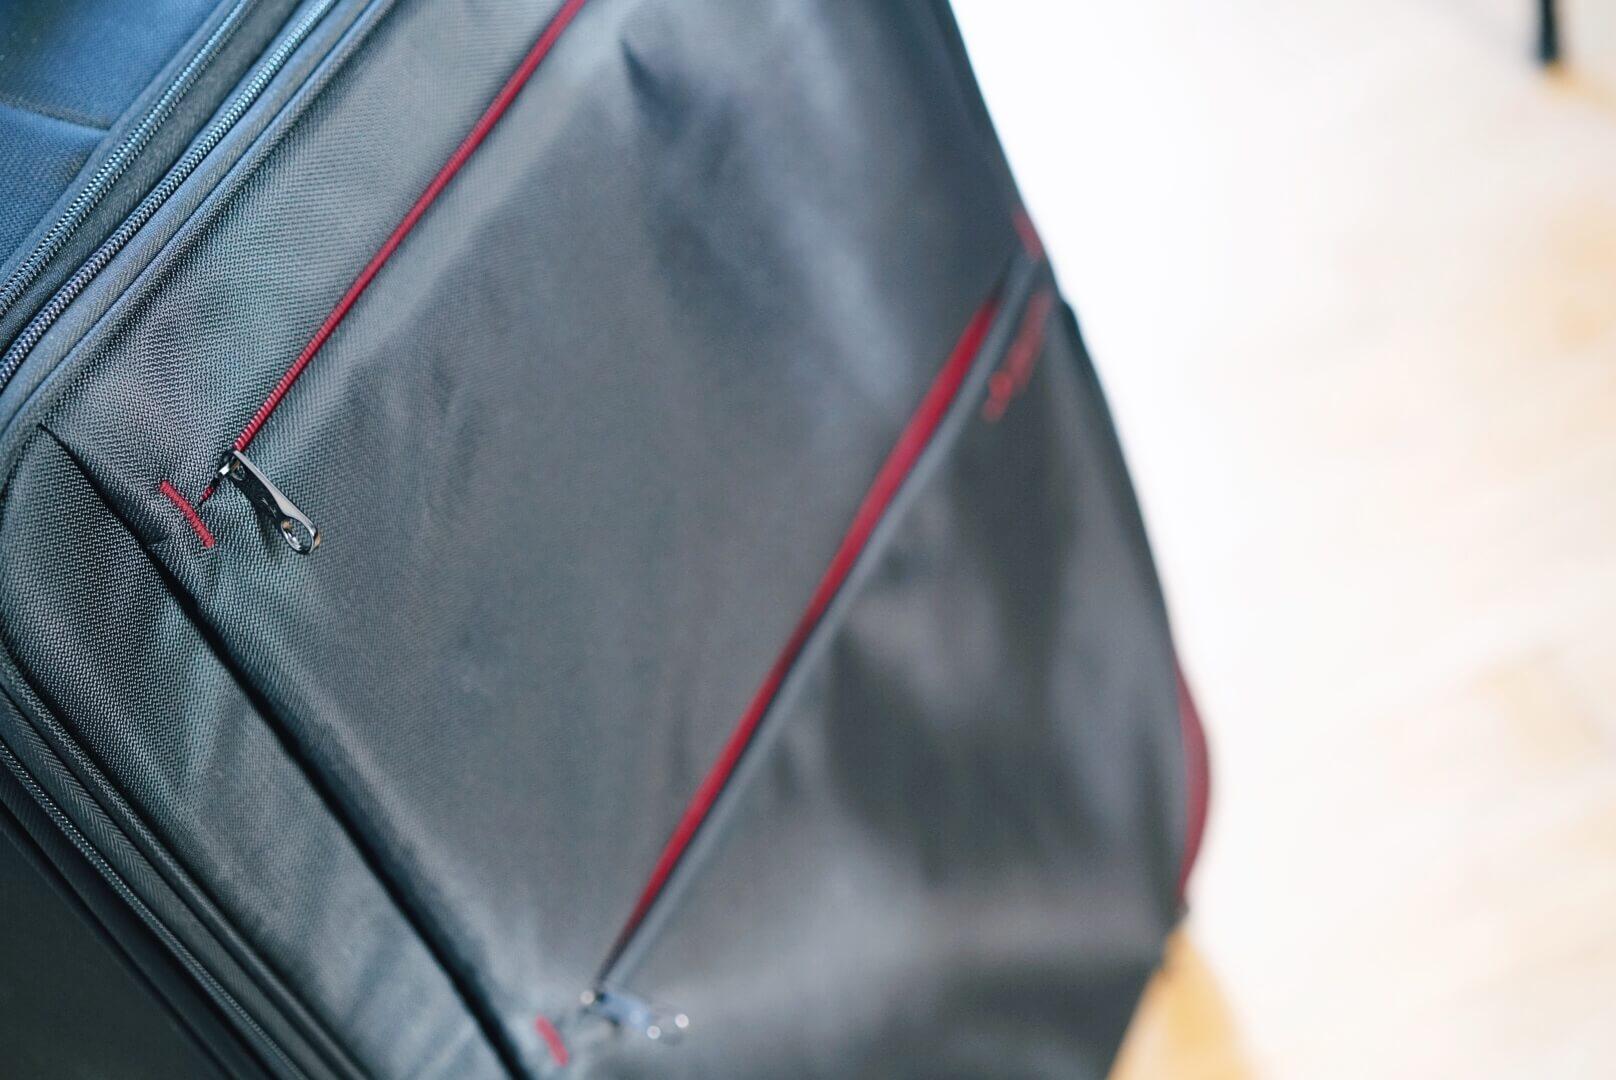 hideo wakamatsu fly2のスーツケースの外収納